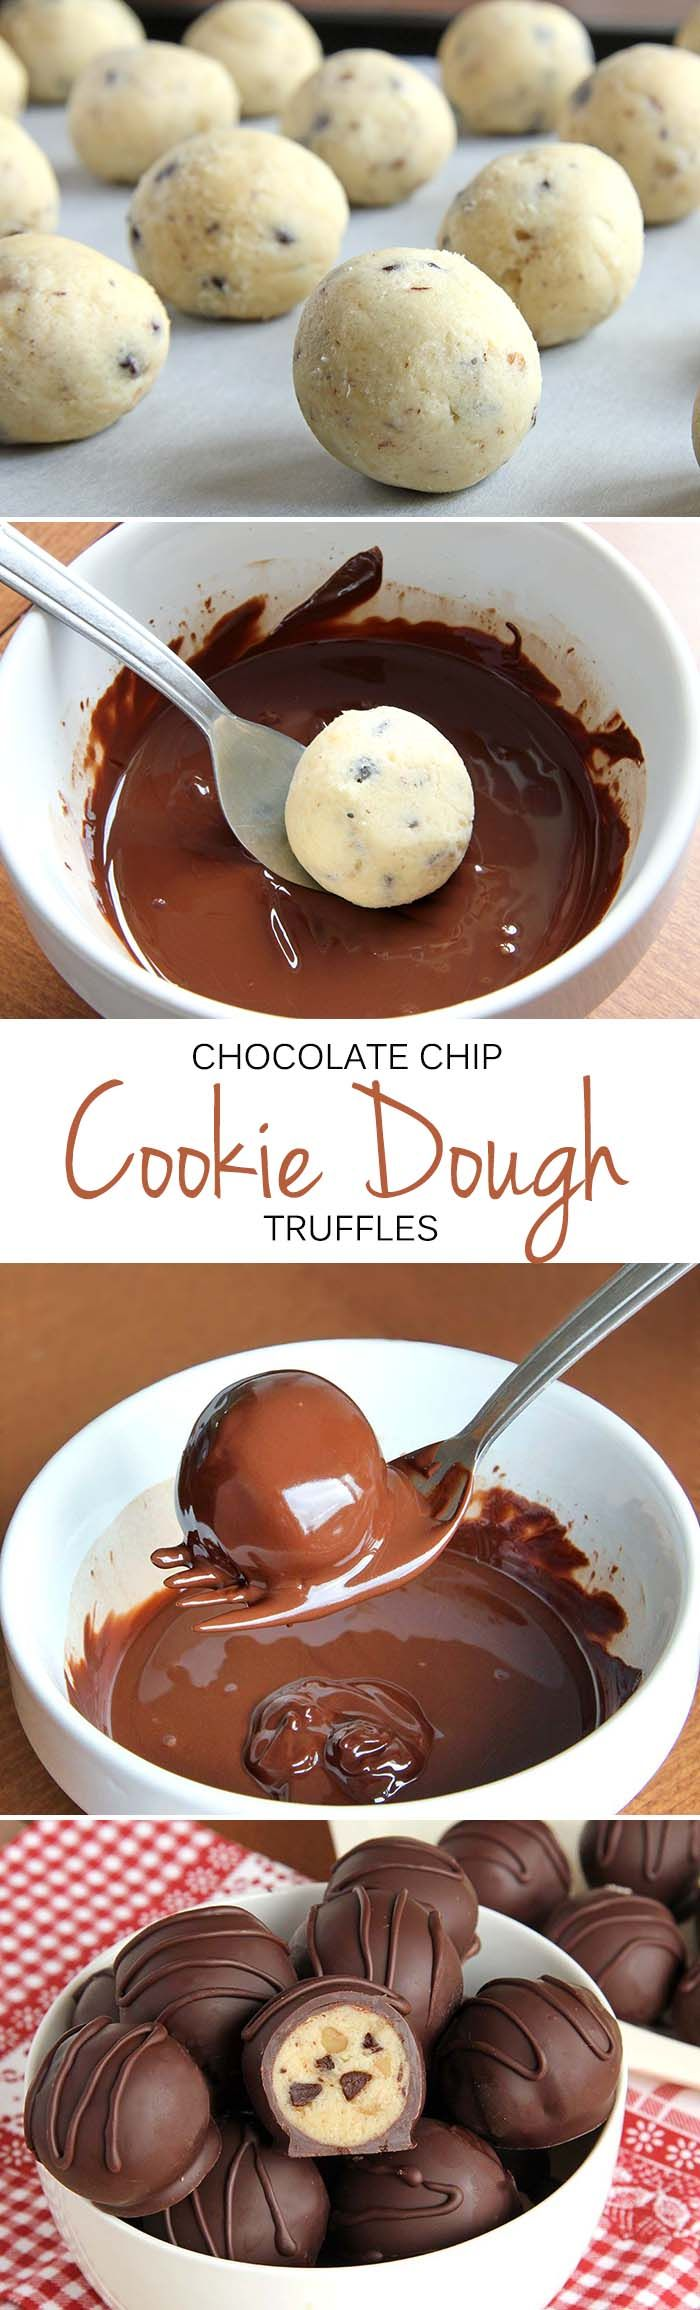 Chocolate Chip Cookie Dough Truffle